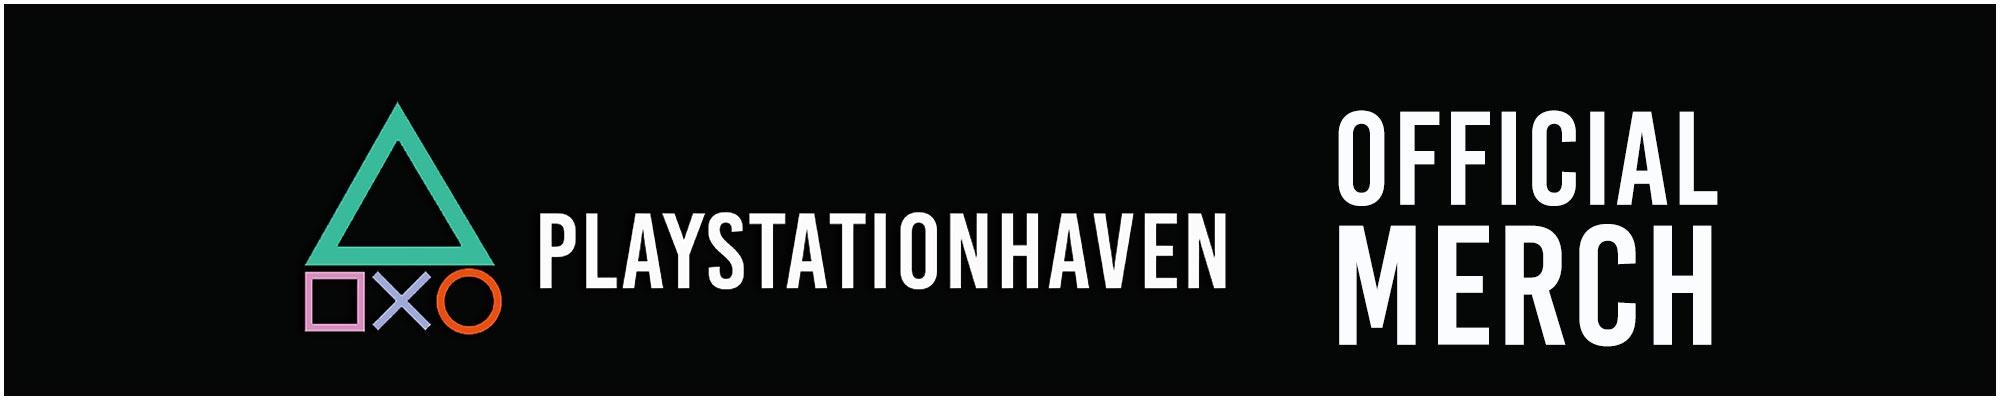 playstationhavengear Cover